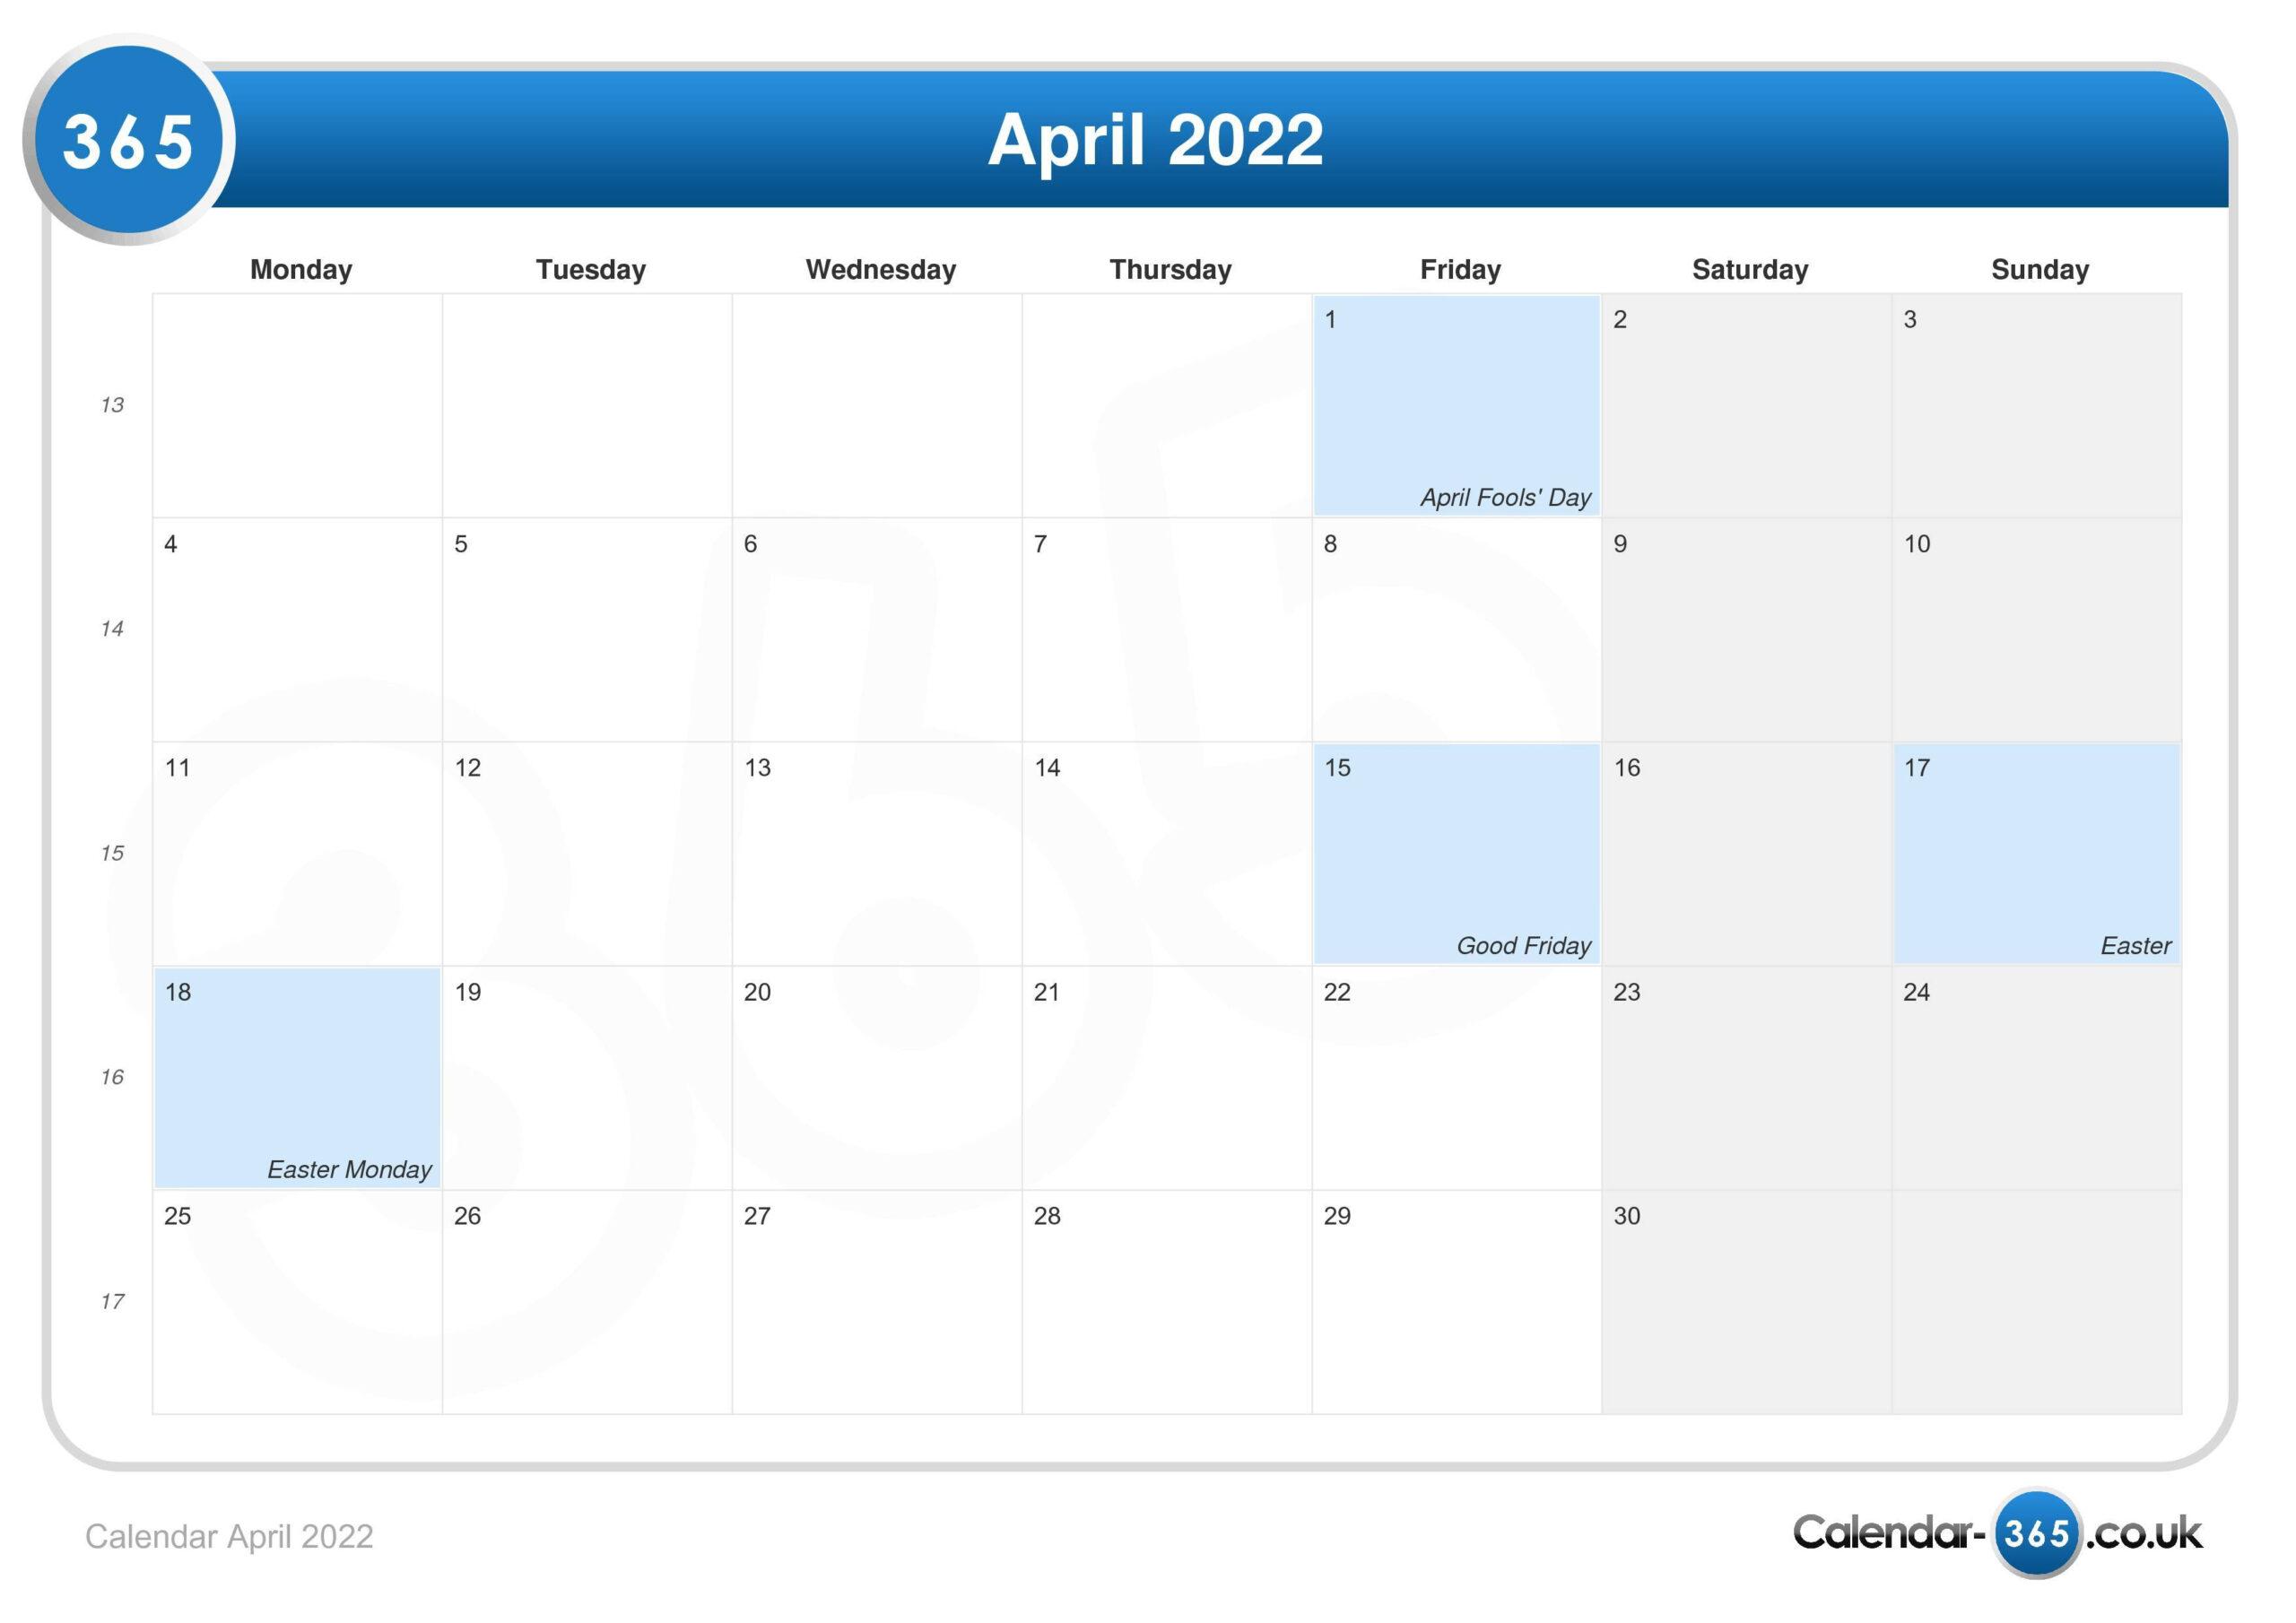 Calendar April 2022